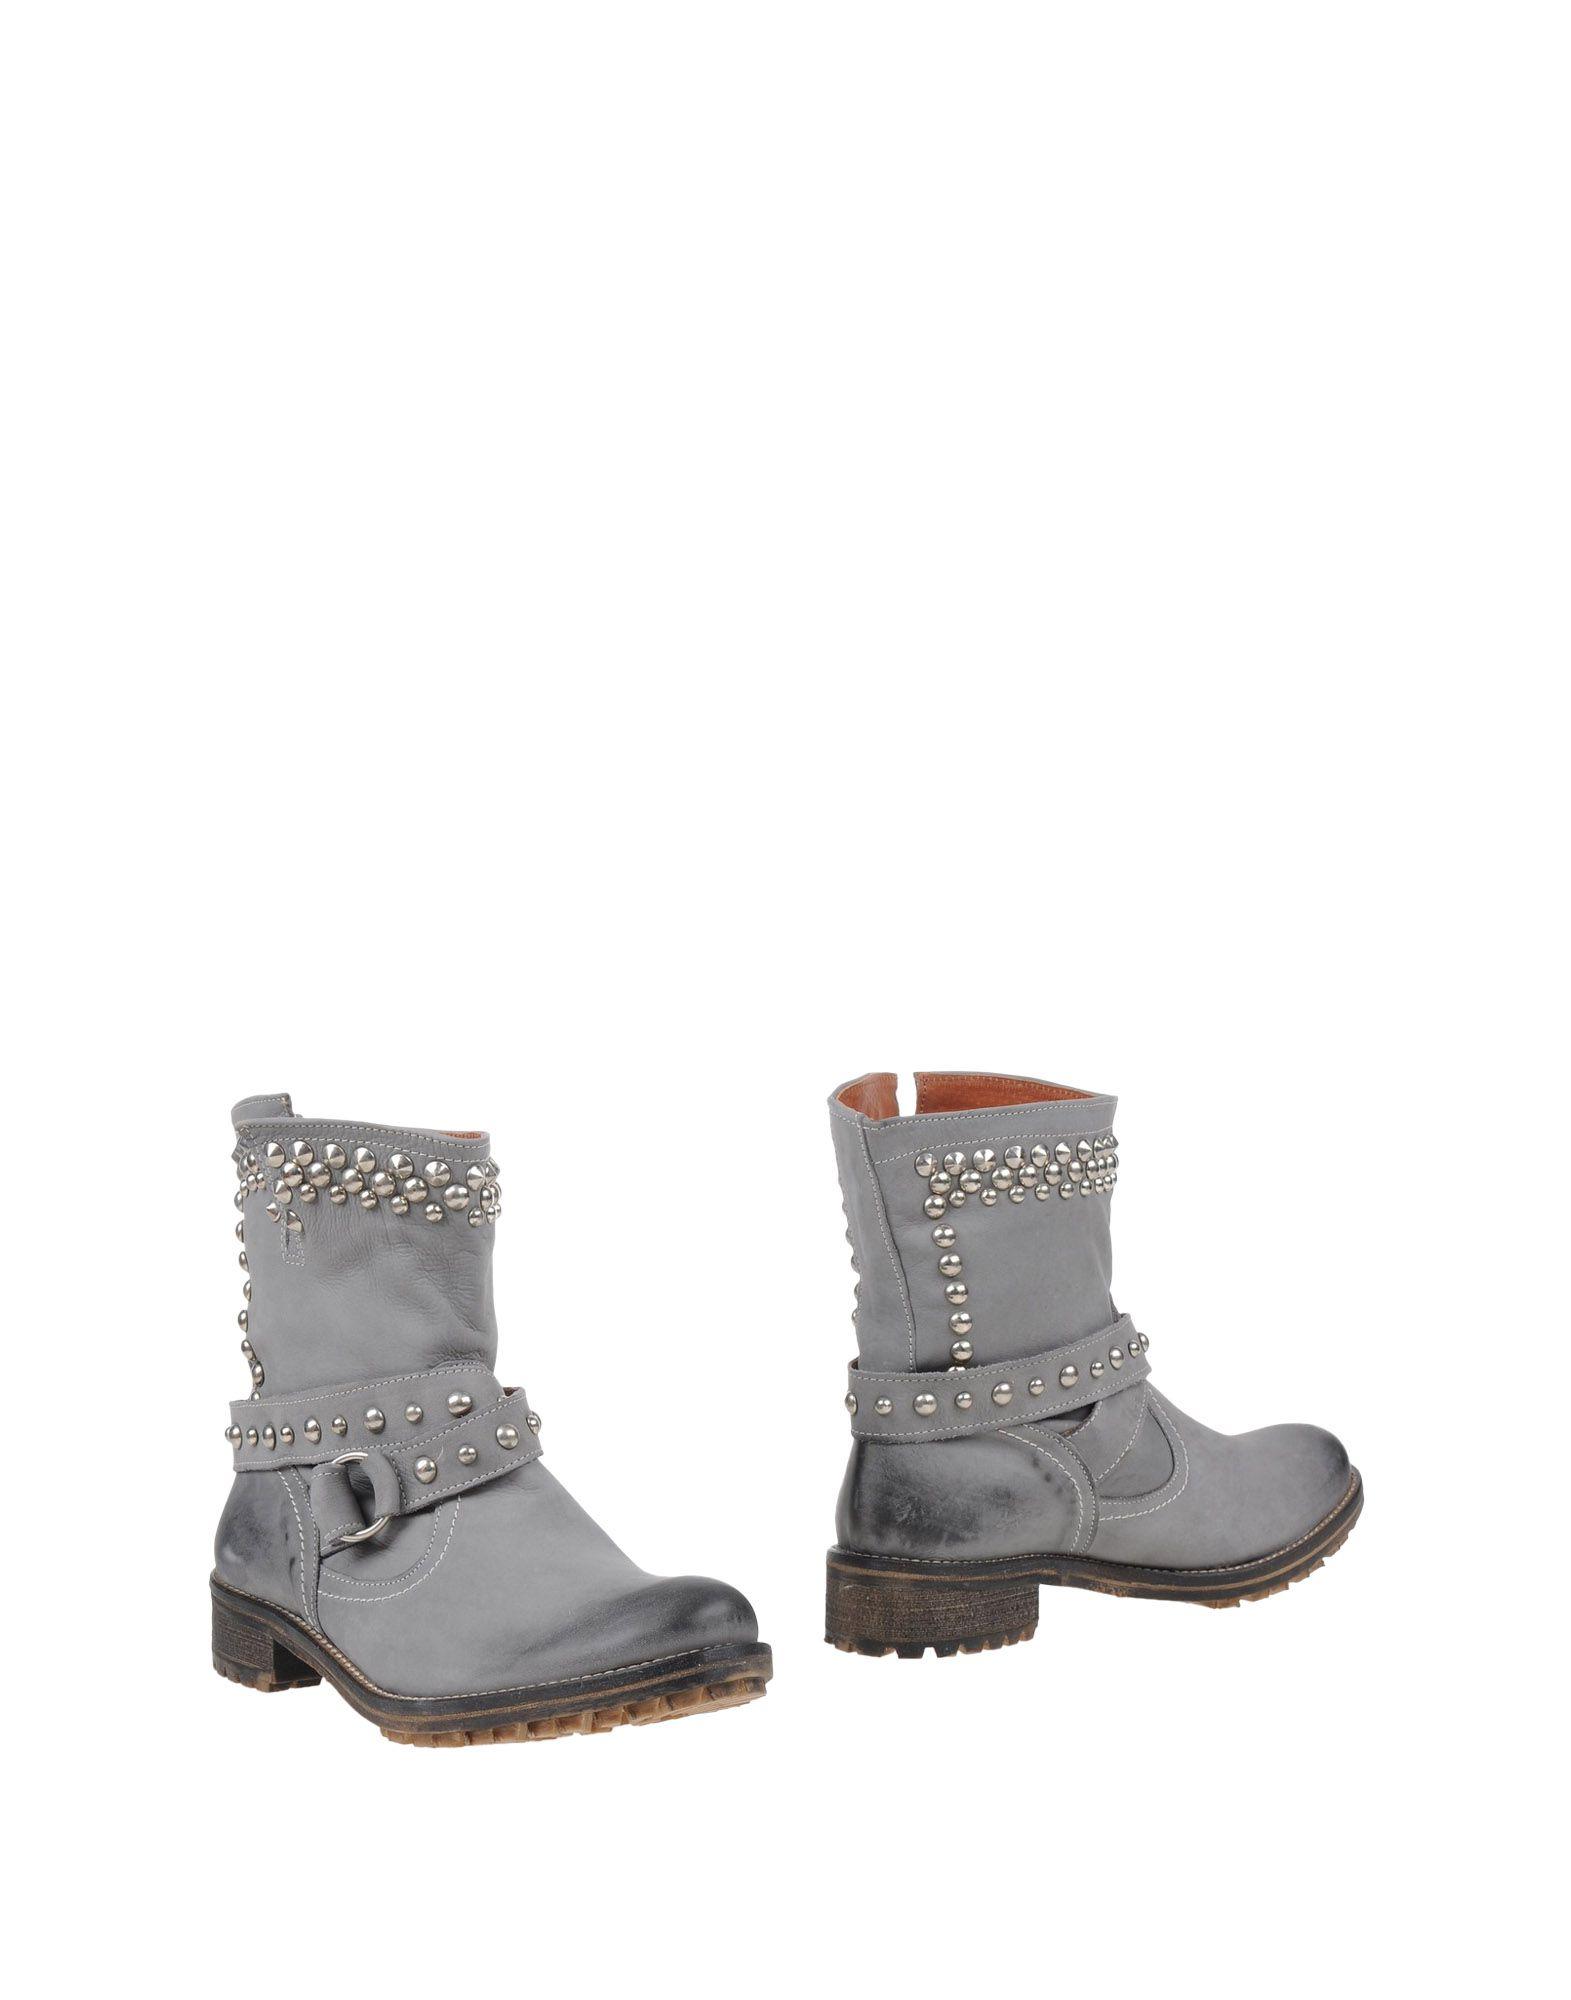 CHIARA FERRAGNI Полусапоги и высокие ботинки слипоны chiara ferragni collection chiara ferragni collection ch056awxbh35